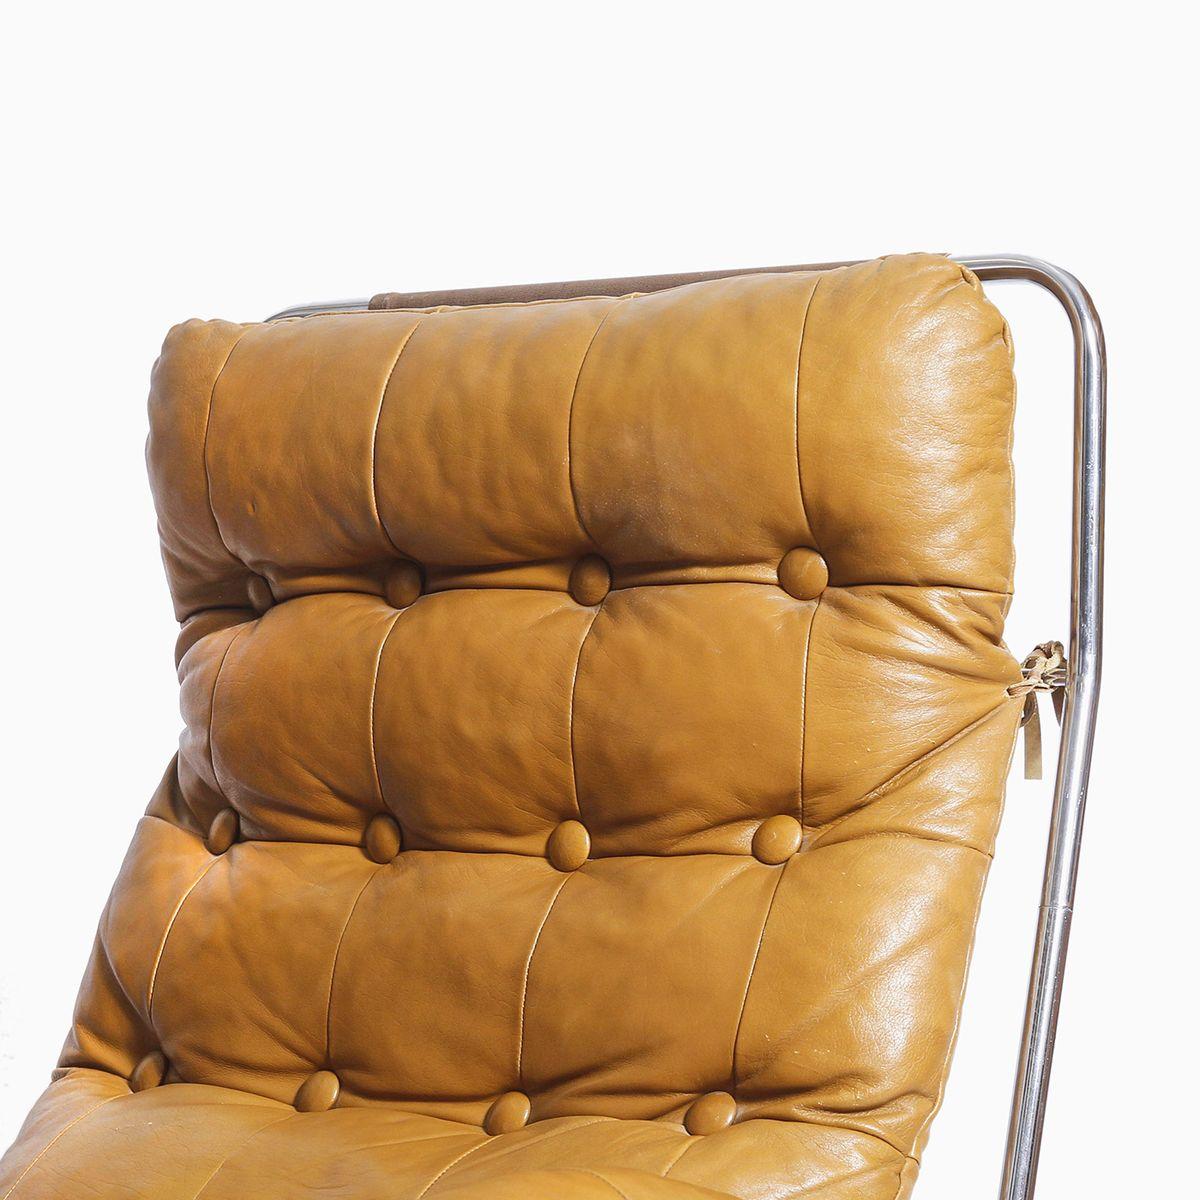 vintage sessel aus leder verchromtem stahlrohr bei pamono kaufen. Black Bedroom Furniture Sets. Home Design Ideas